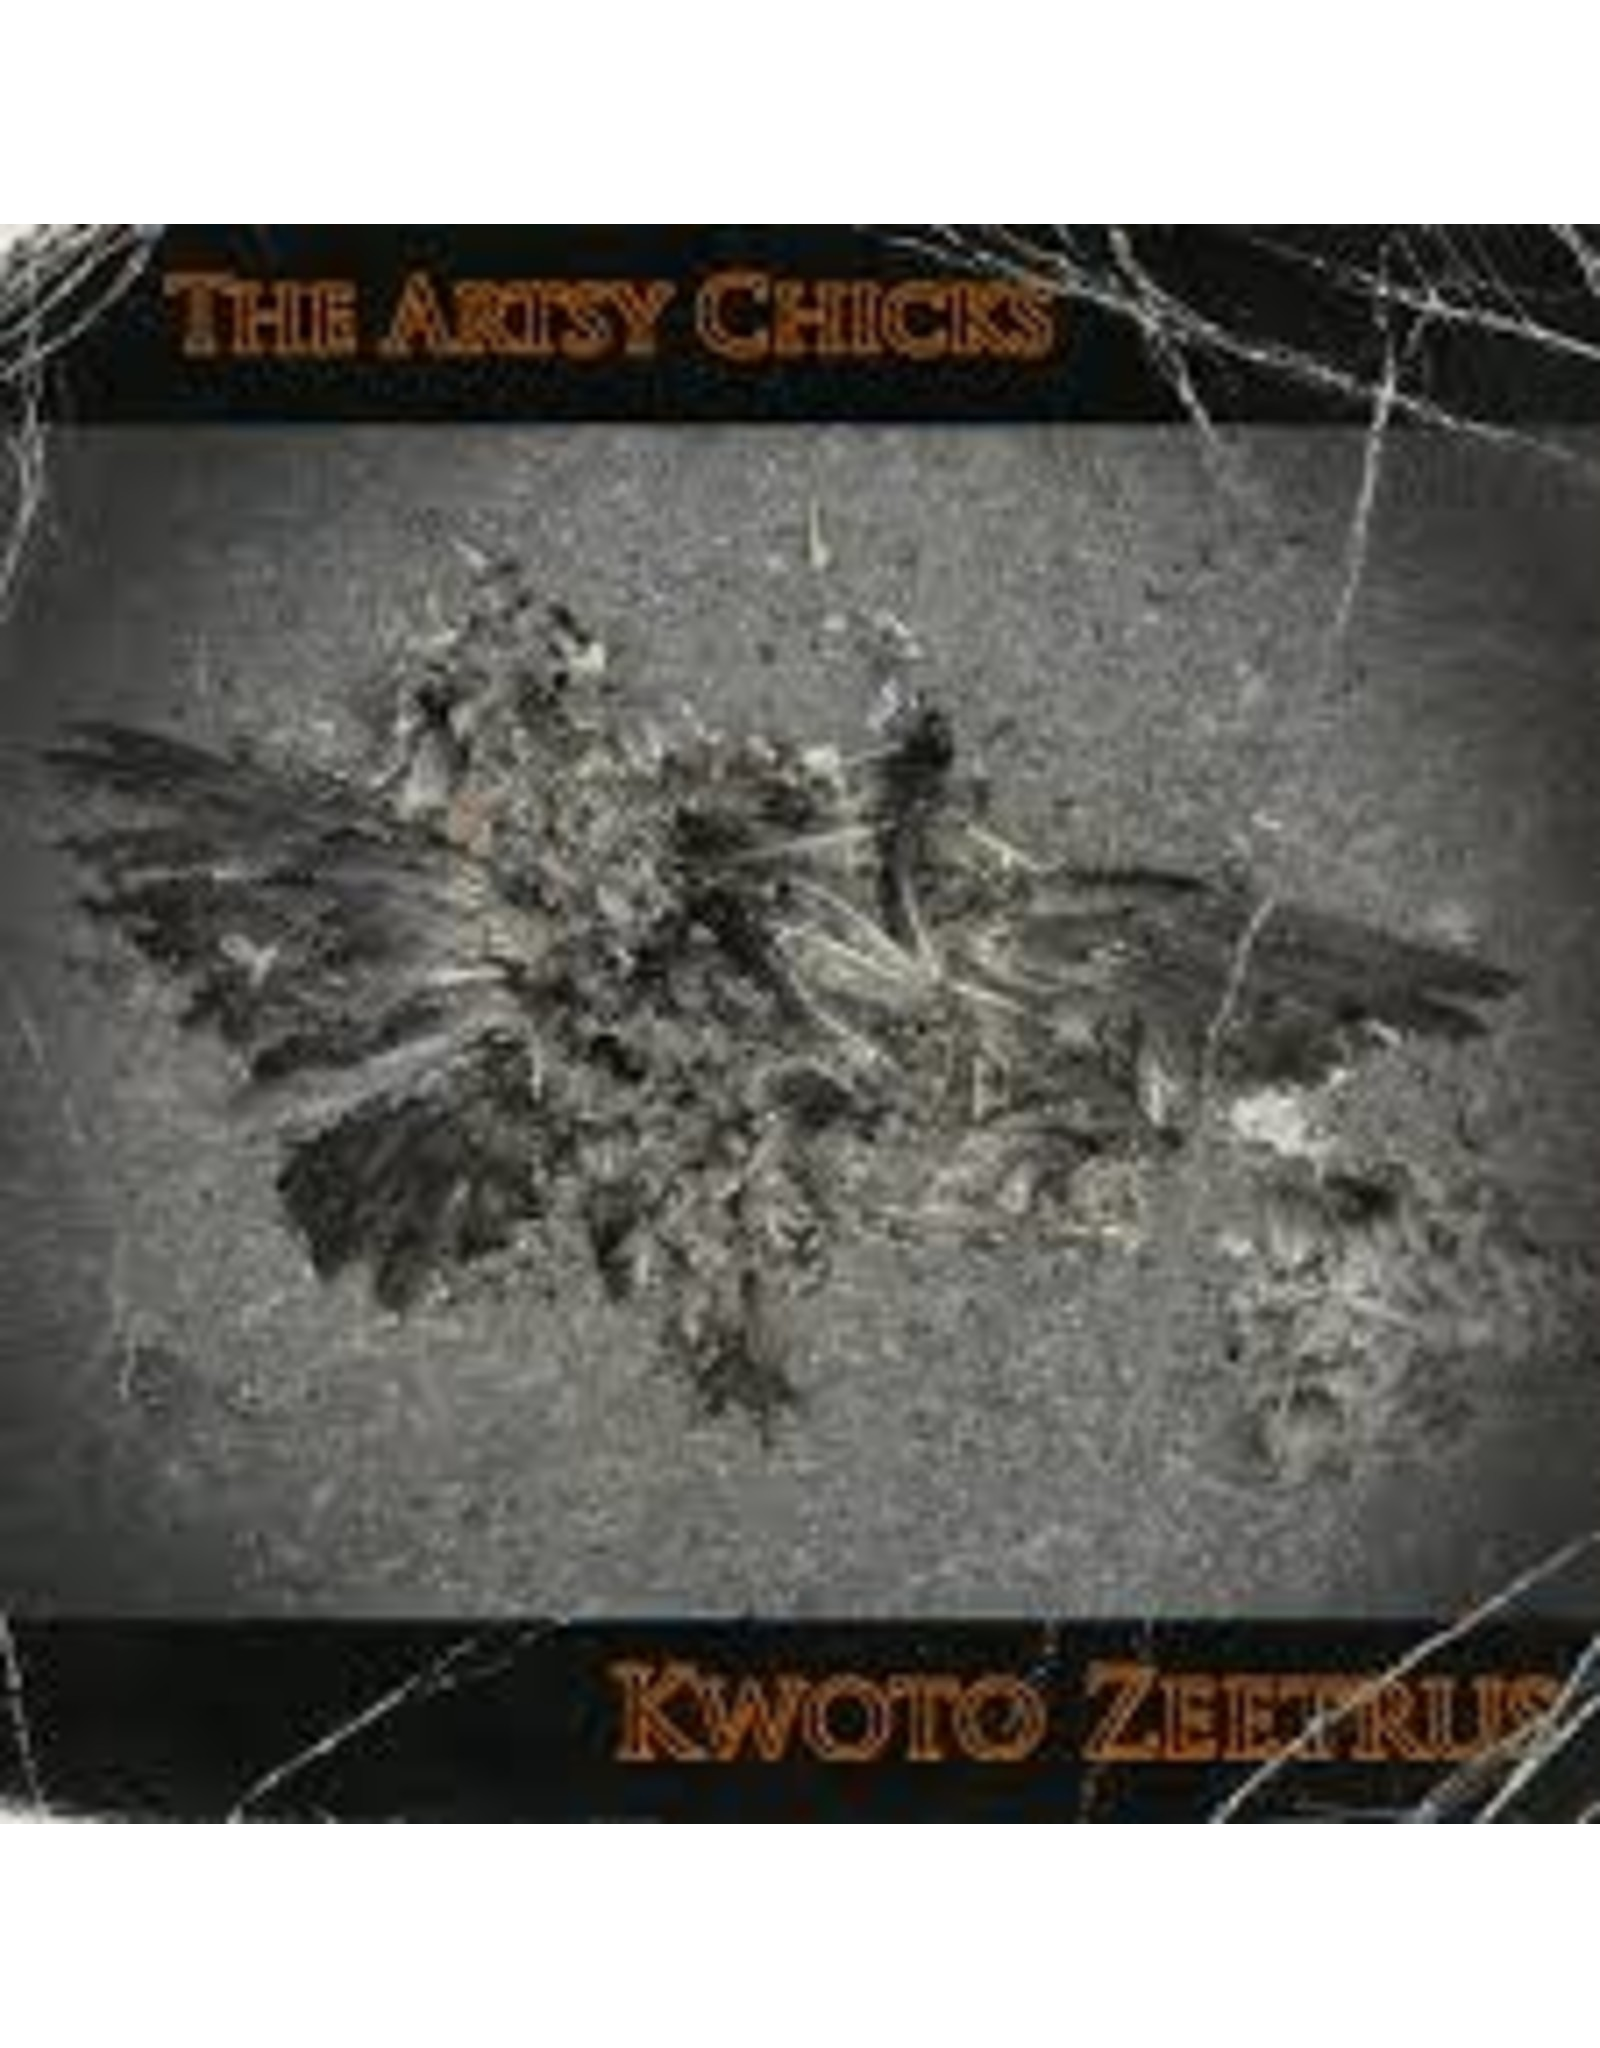 Artsy Chicks, The - Kwoto Zeetrus CD